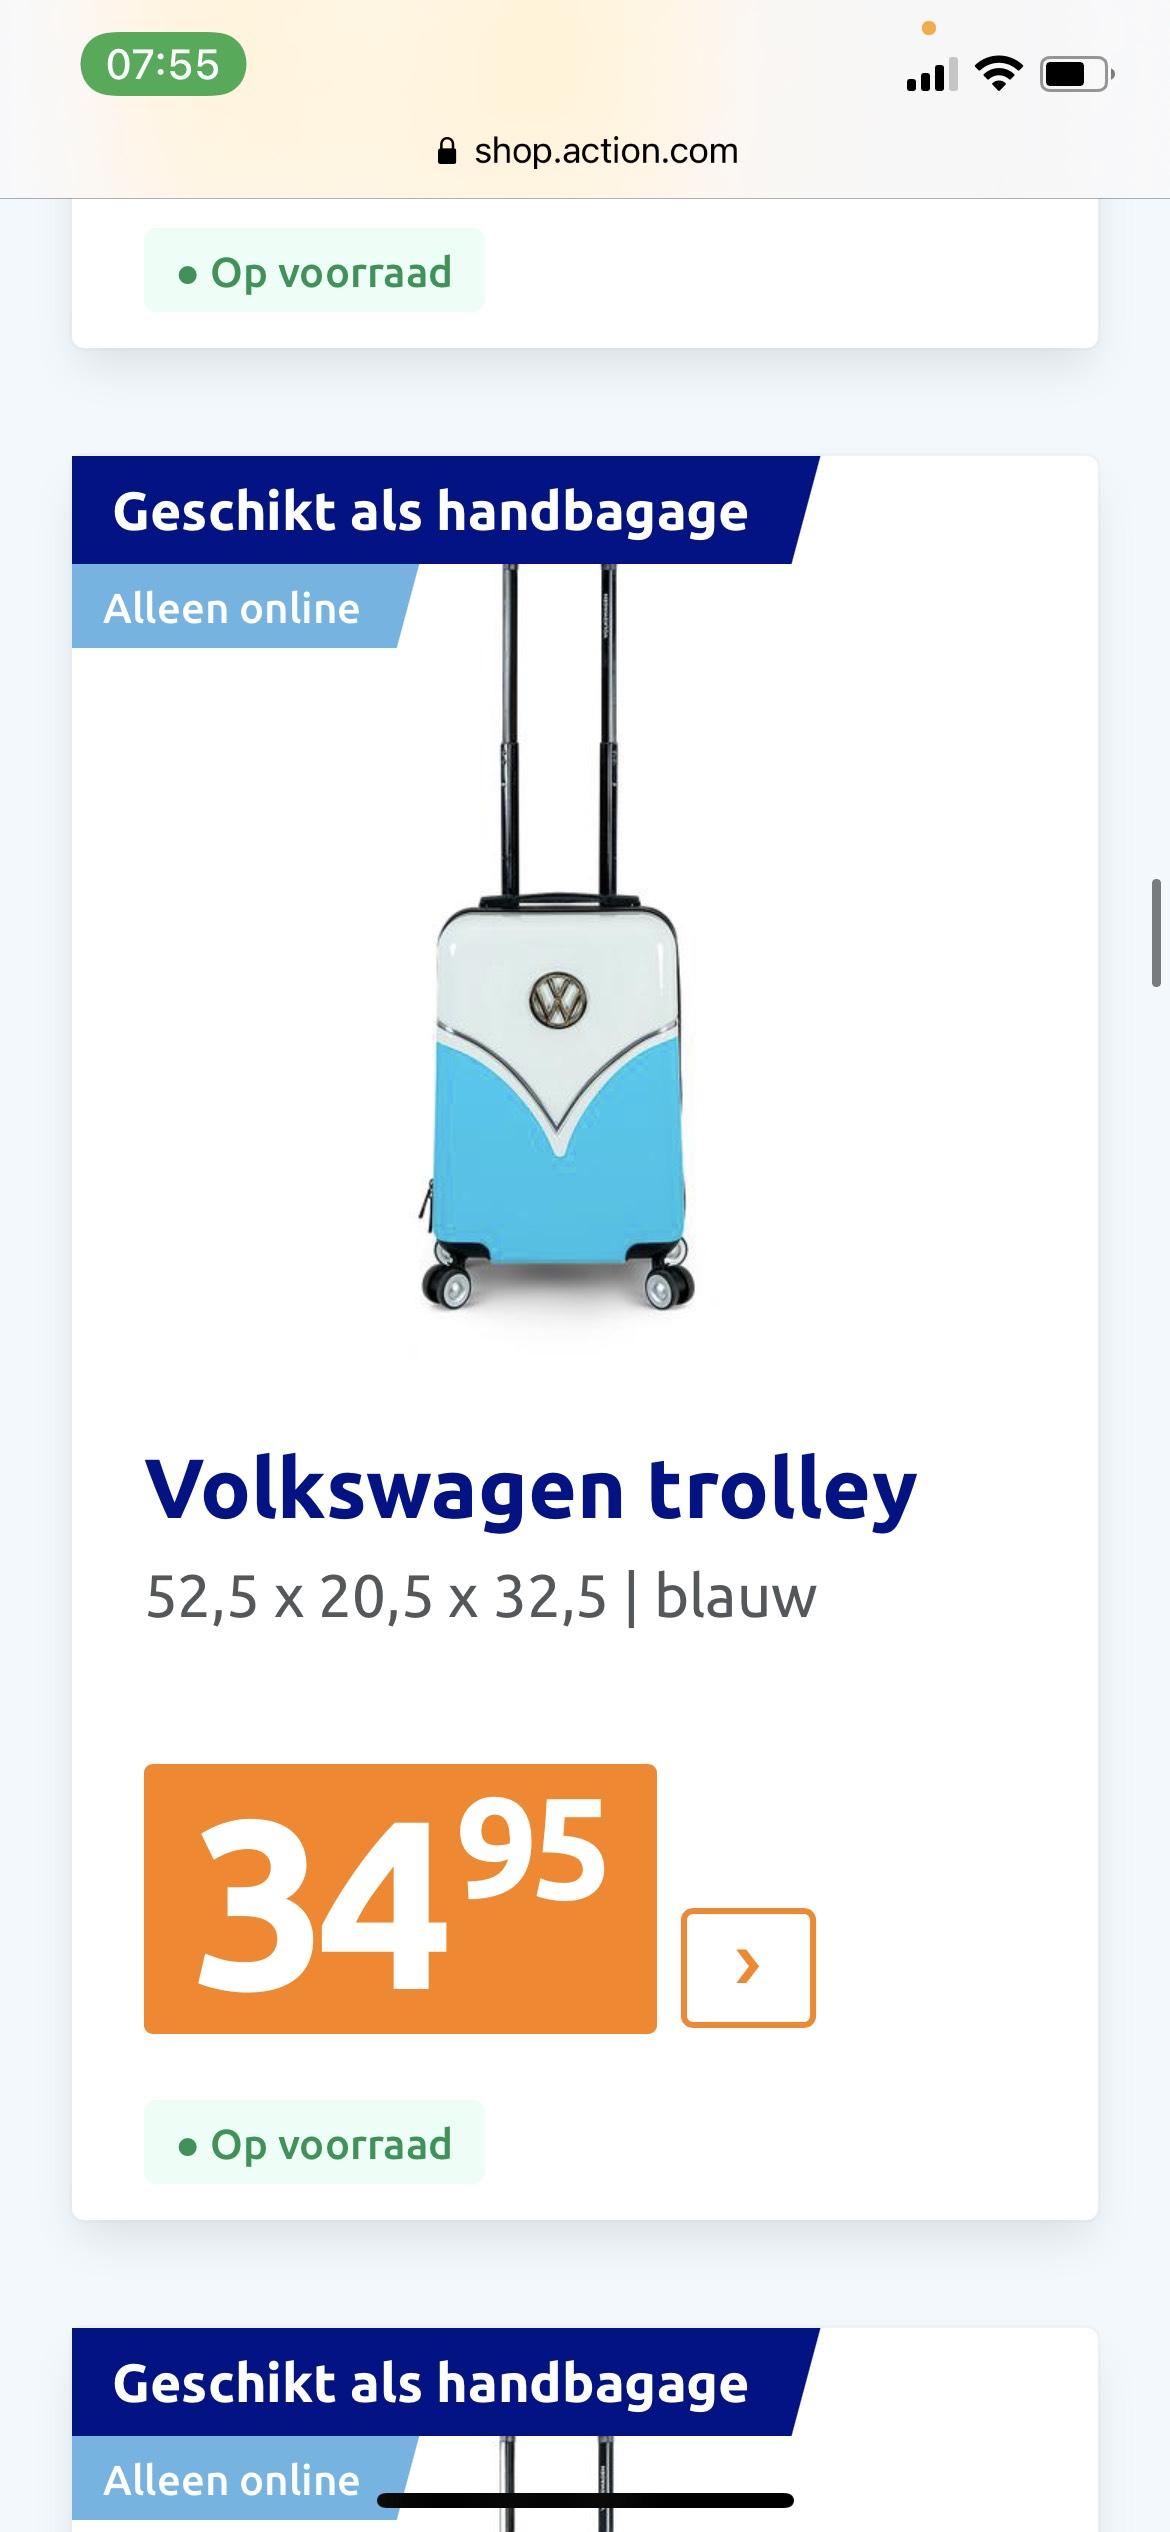 Volkswagen Trolley aanbieding